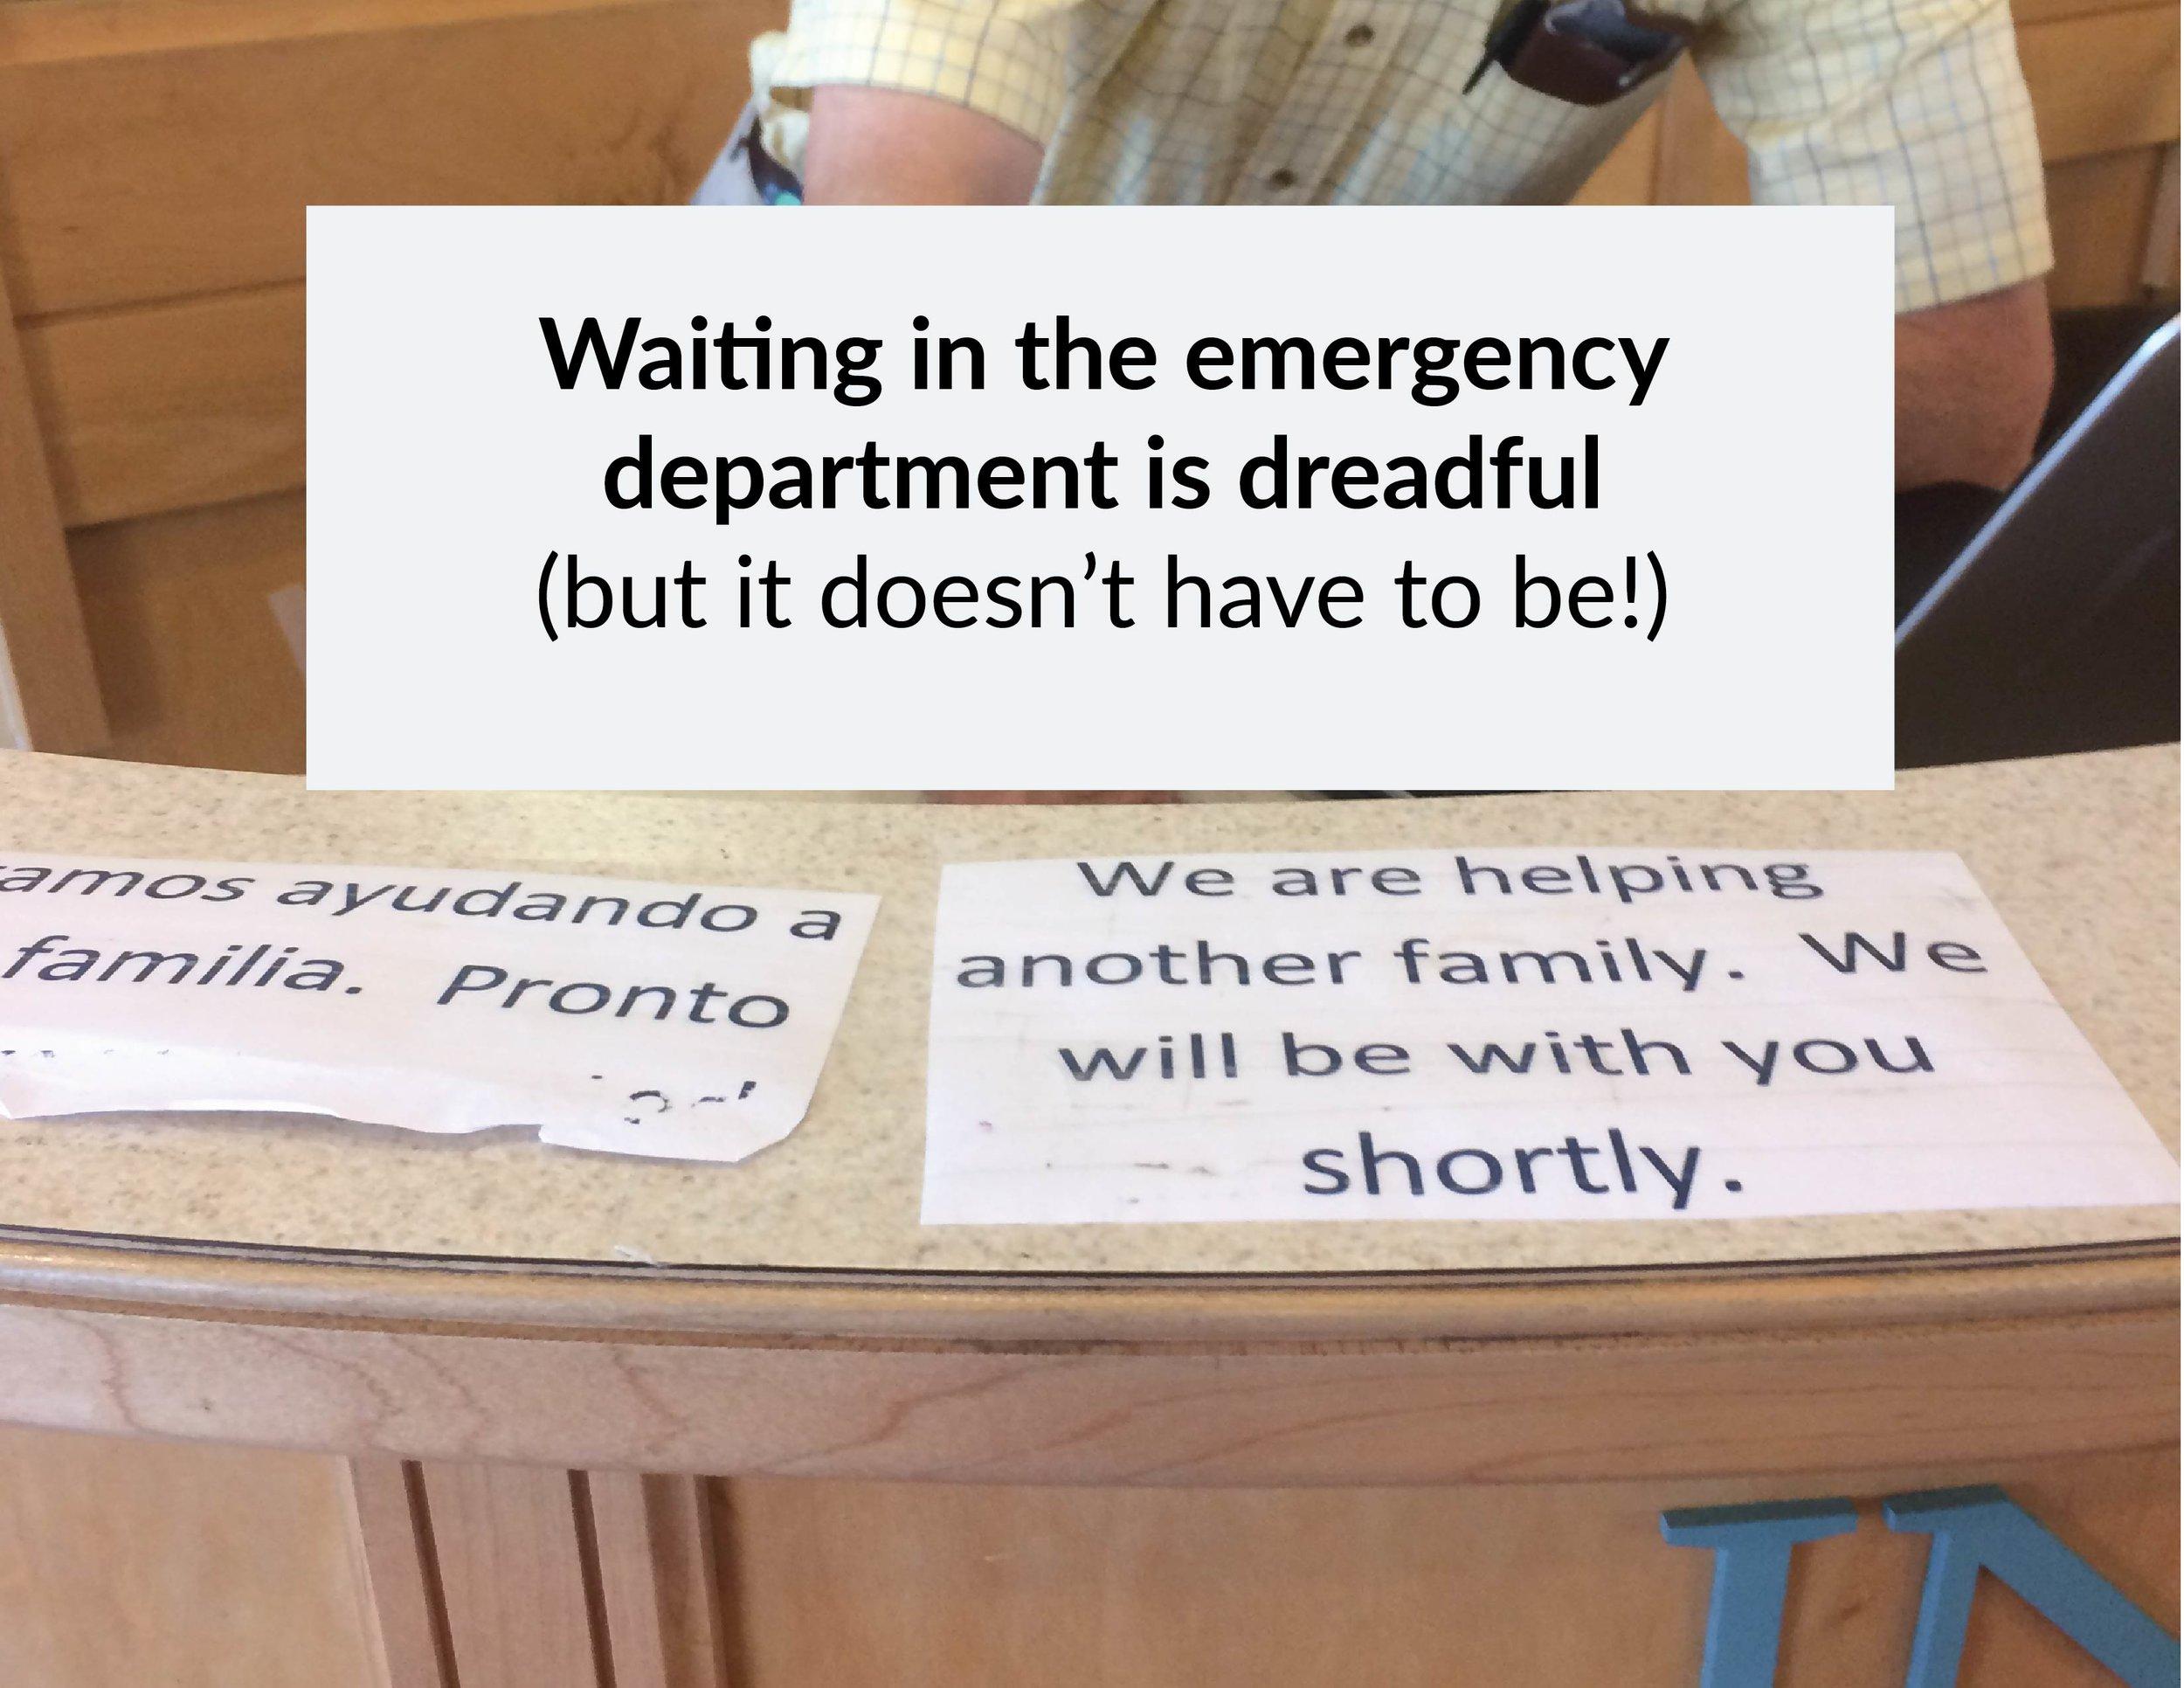 Taken at the Rhode Island Hospital Emergency Department